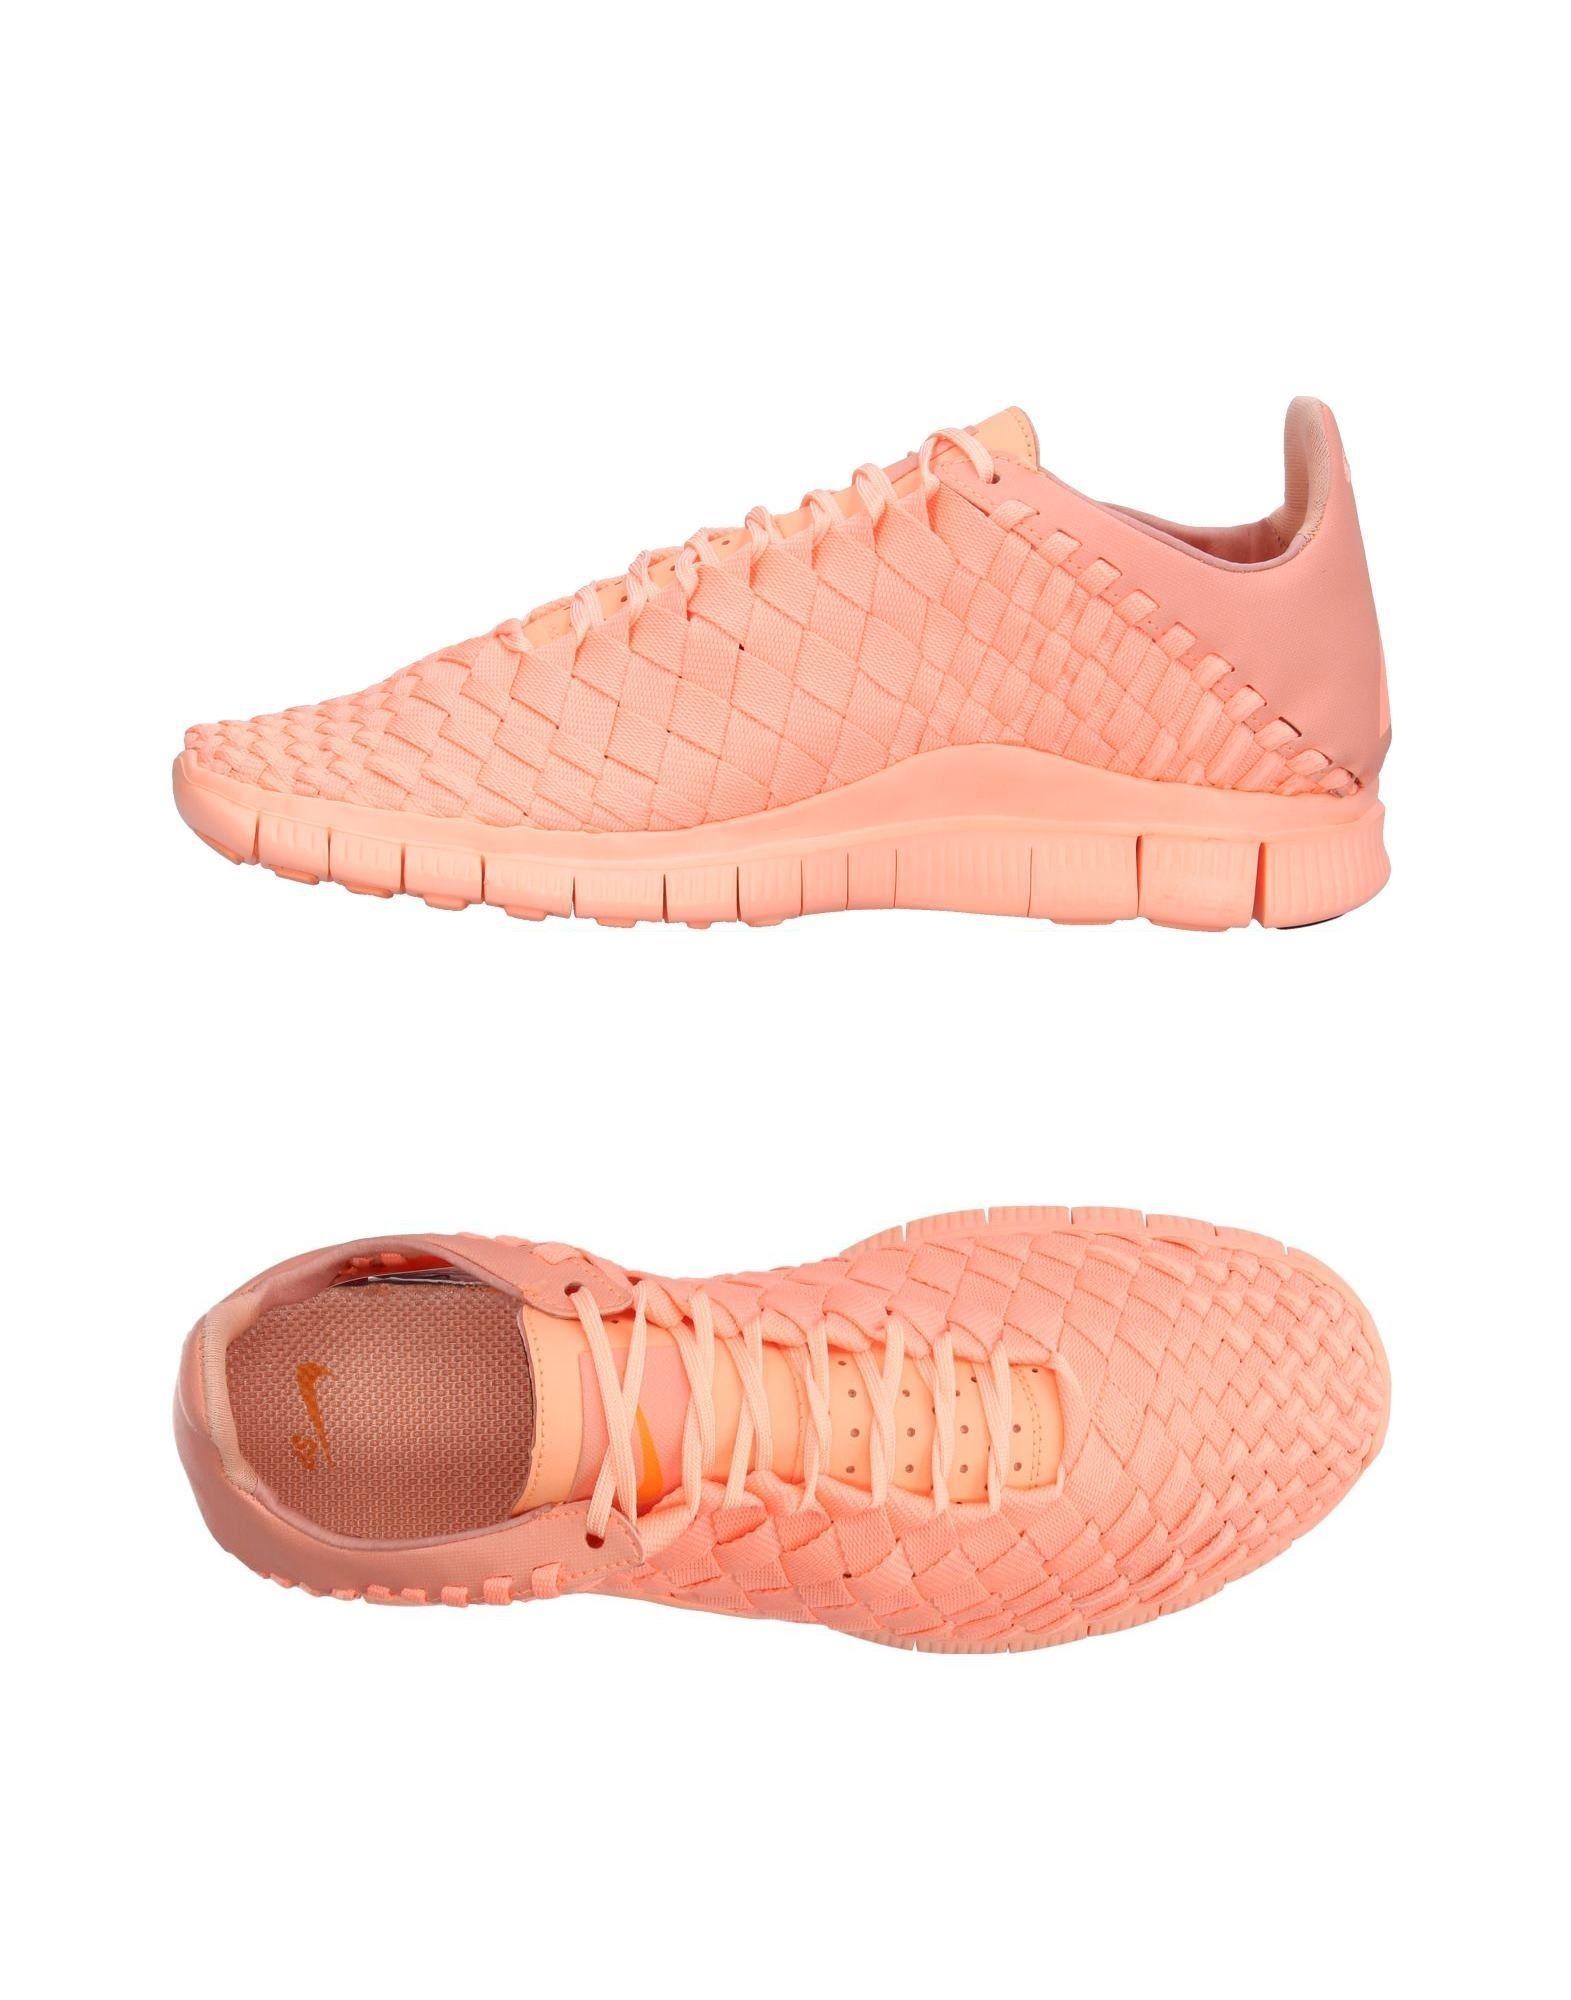 Nike Sneakers In Salmon Pink   ModeSens